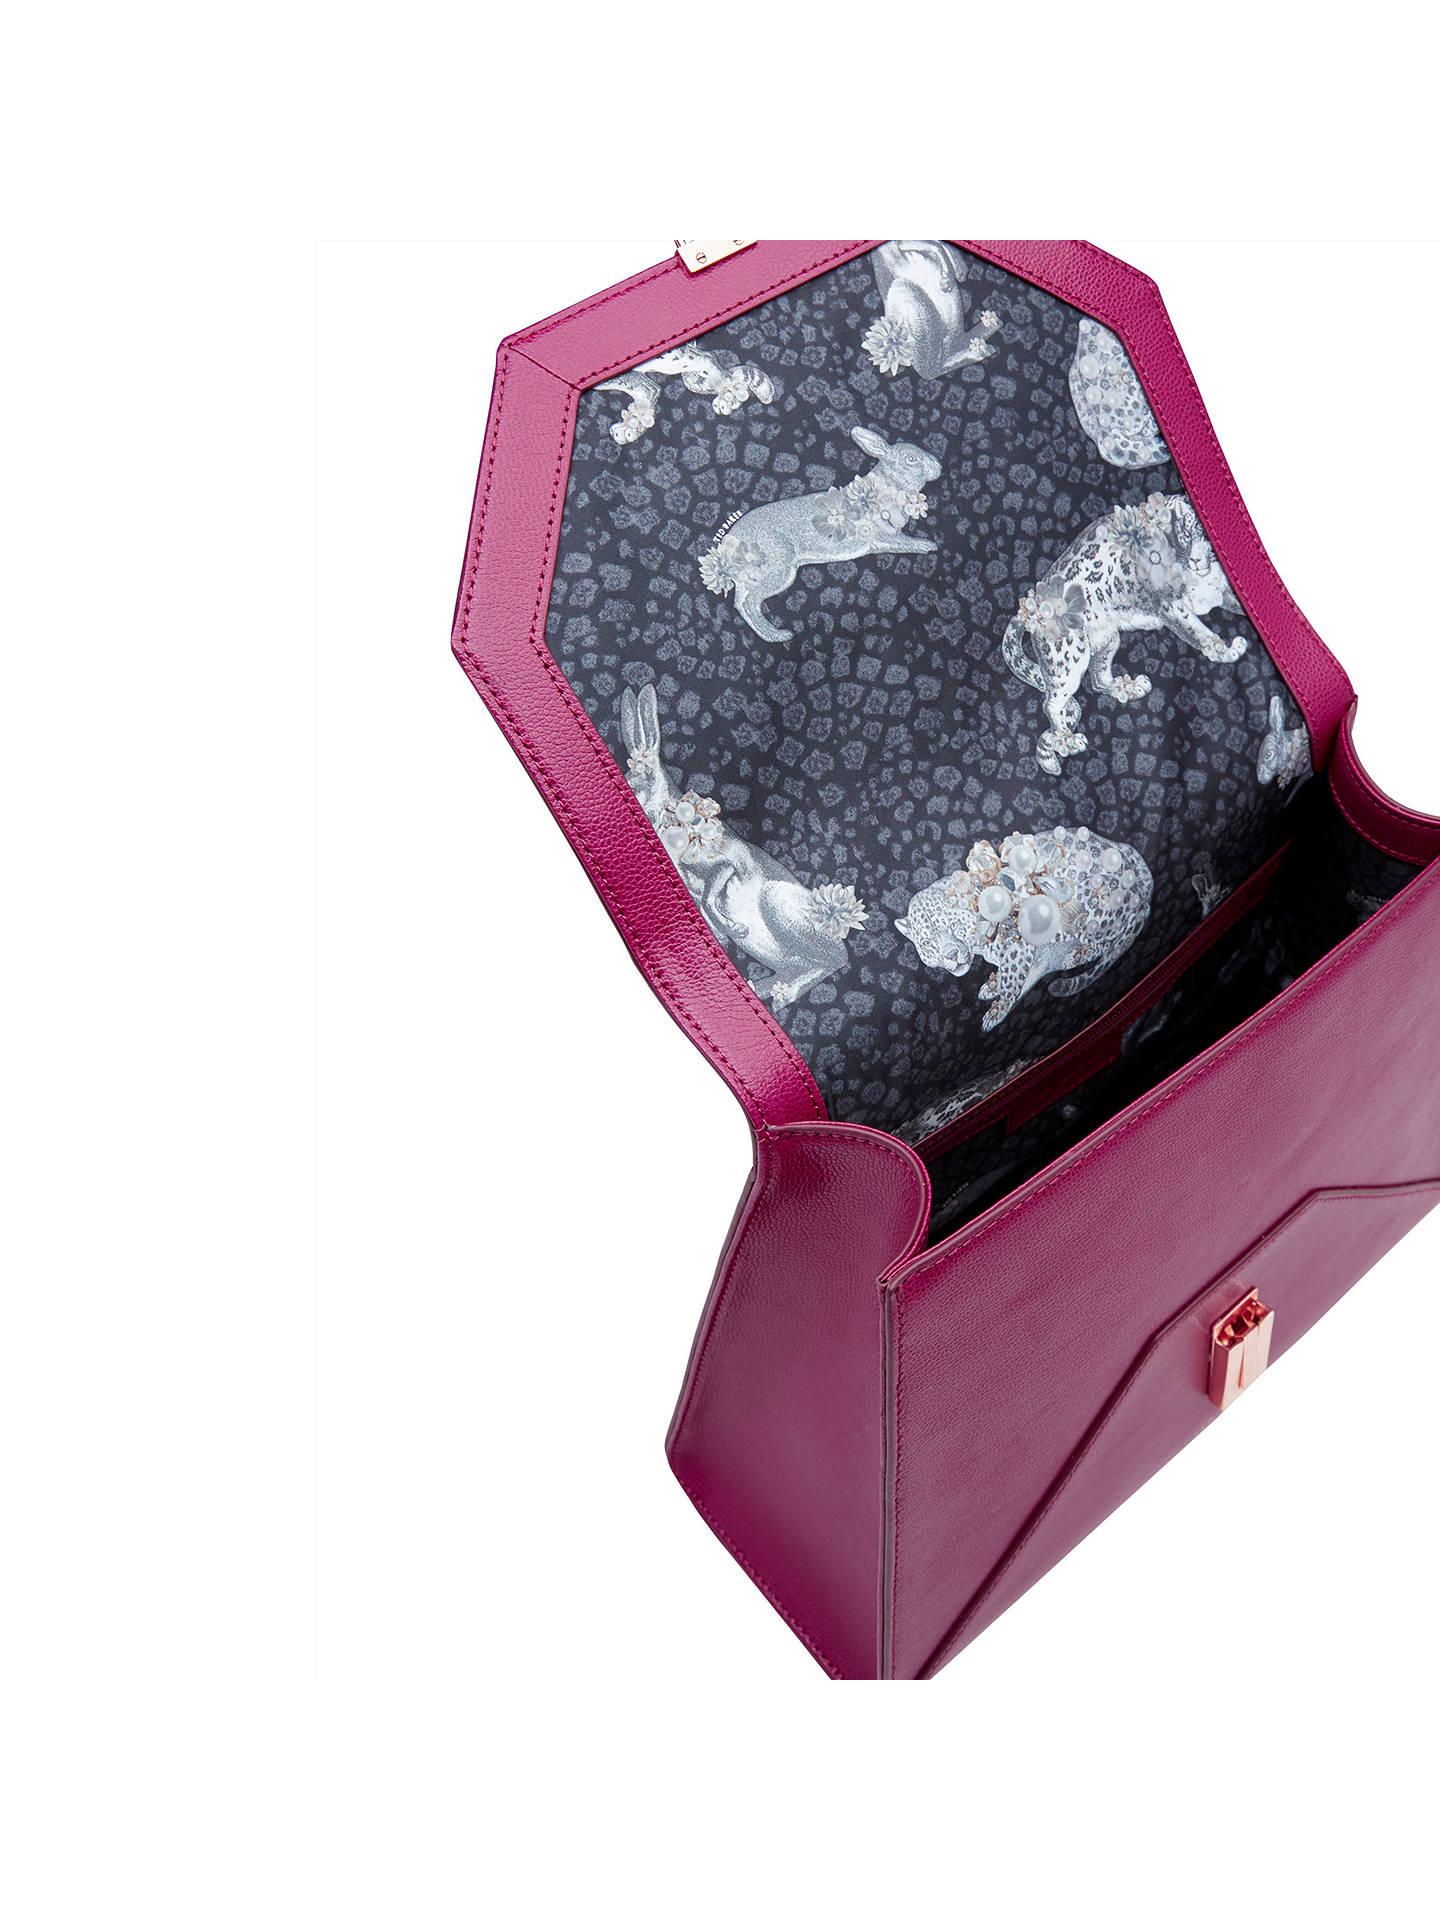 5a2dc2a7d83 ... Buy Ted Baker Ellice Leather Top Handle Grab Bag, Grape Online at  johnlewis.com ...